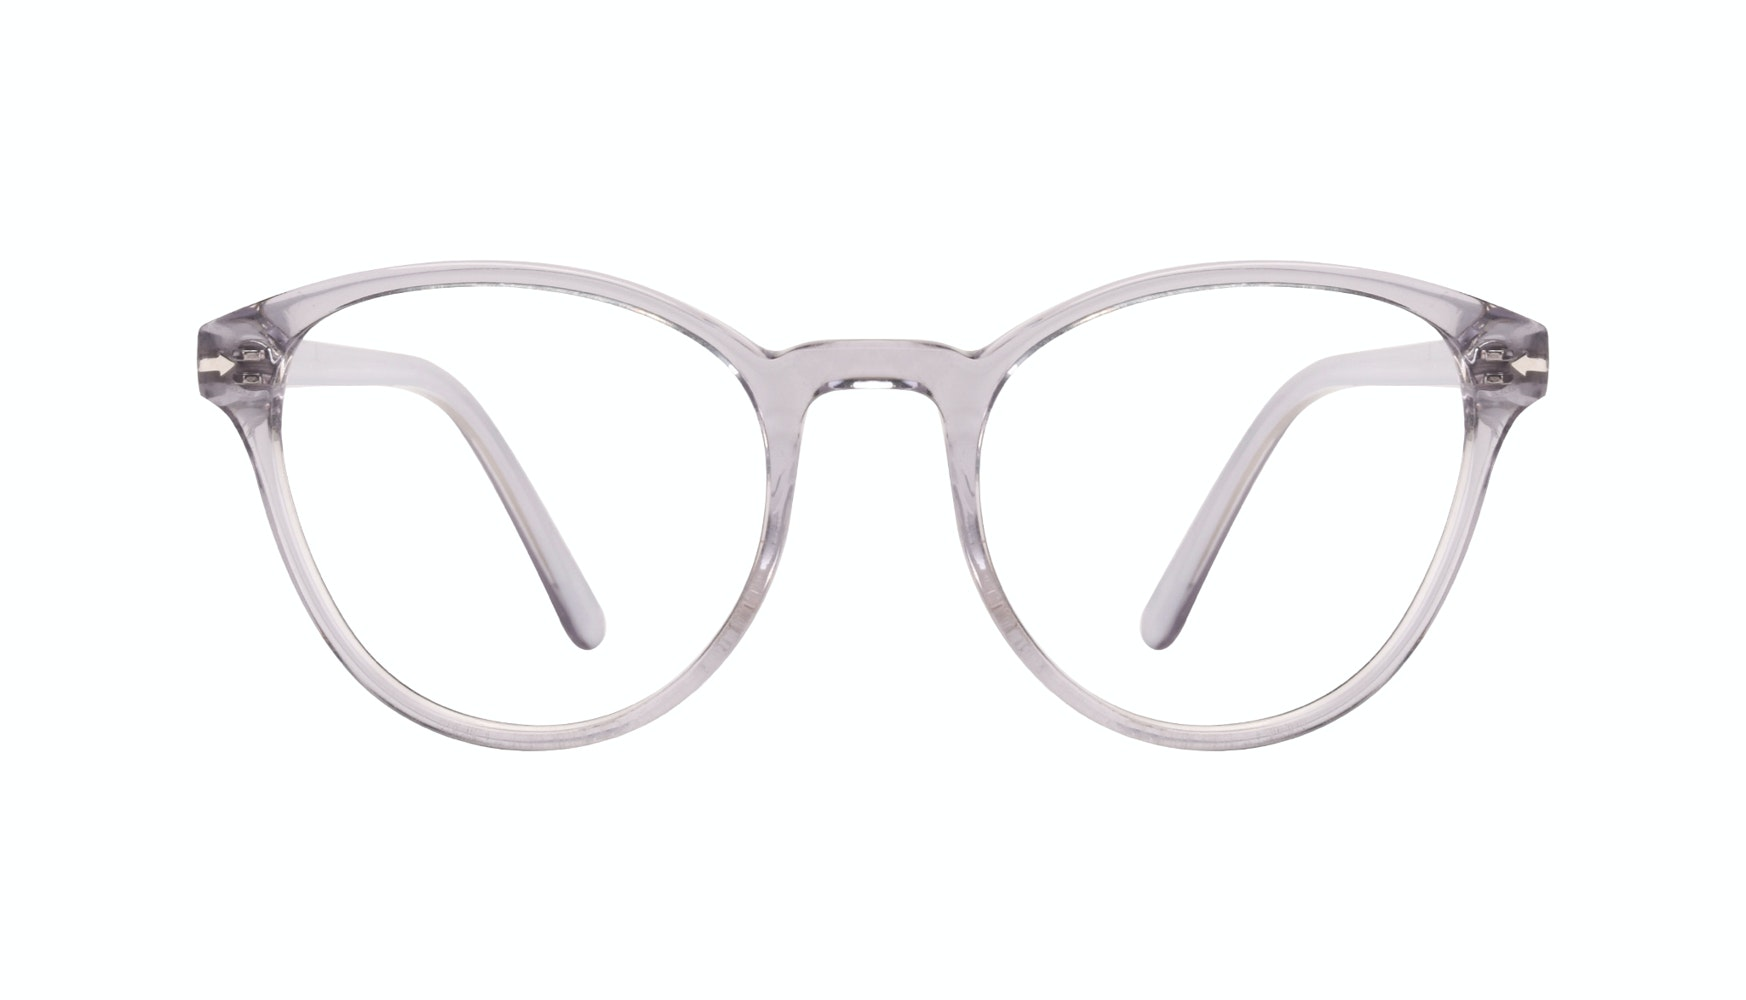 Affordable Fashion Glasses Round Eyeglasses Women London Fog Front